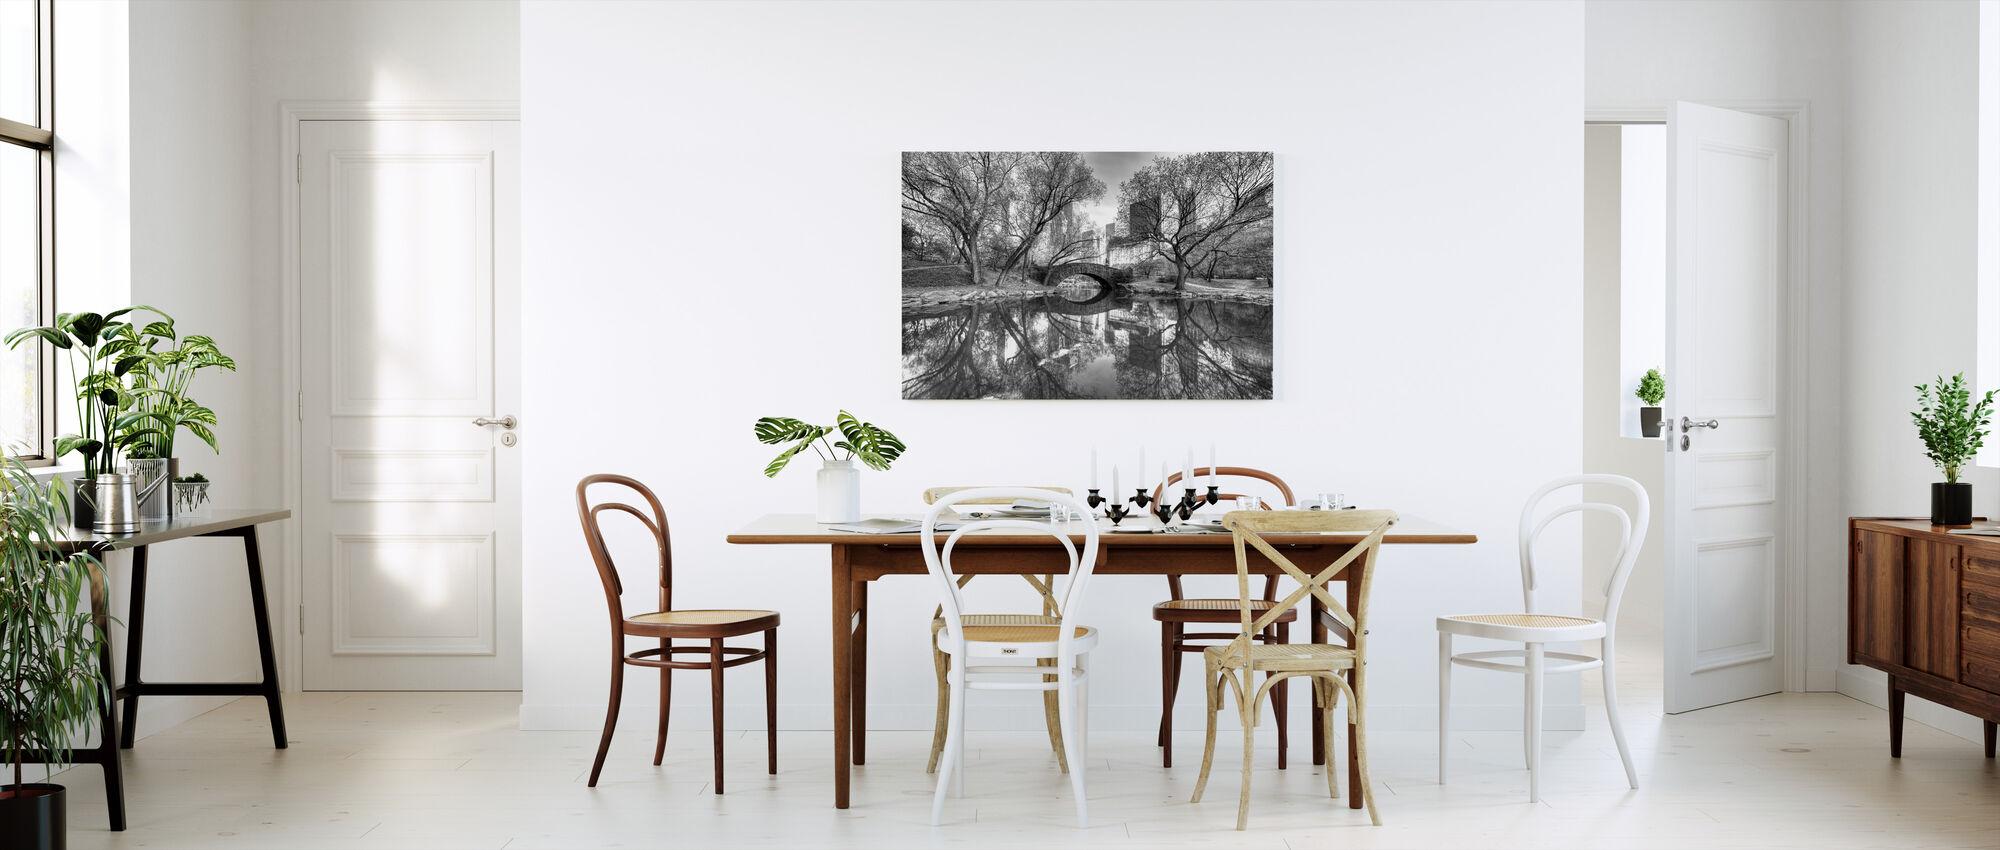 Bridge in Central Park - Canvas print - Kitchen